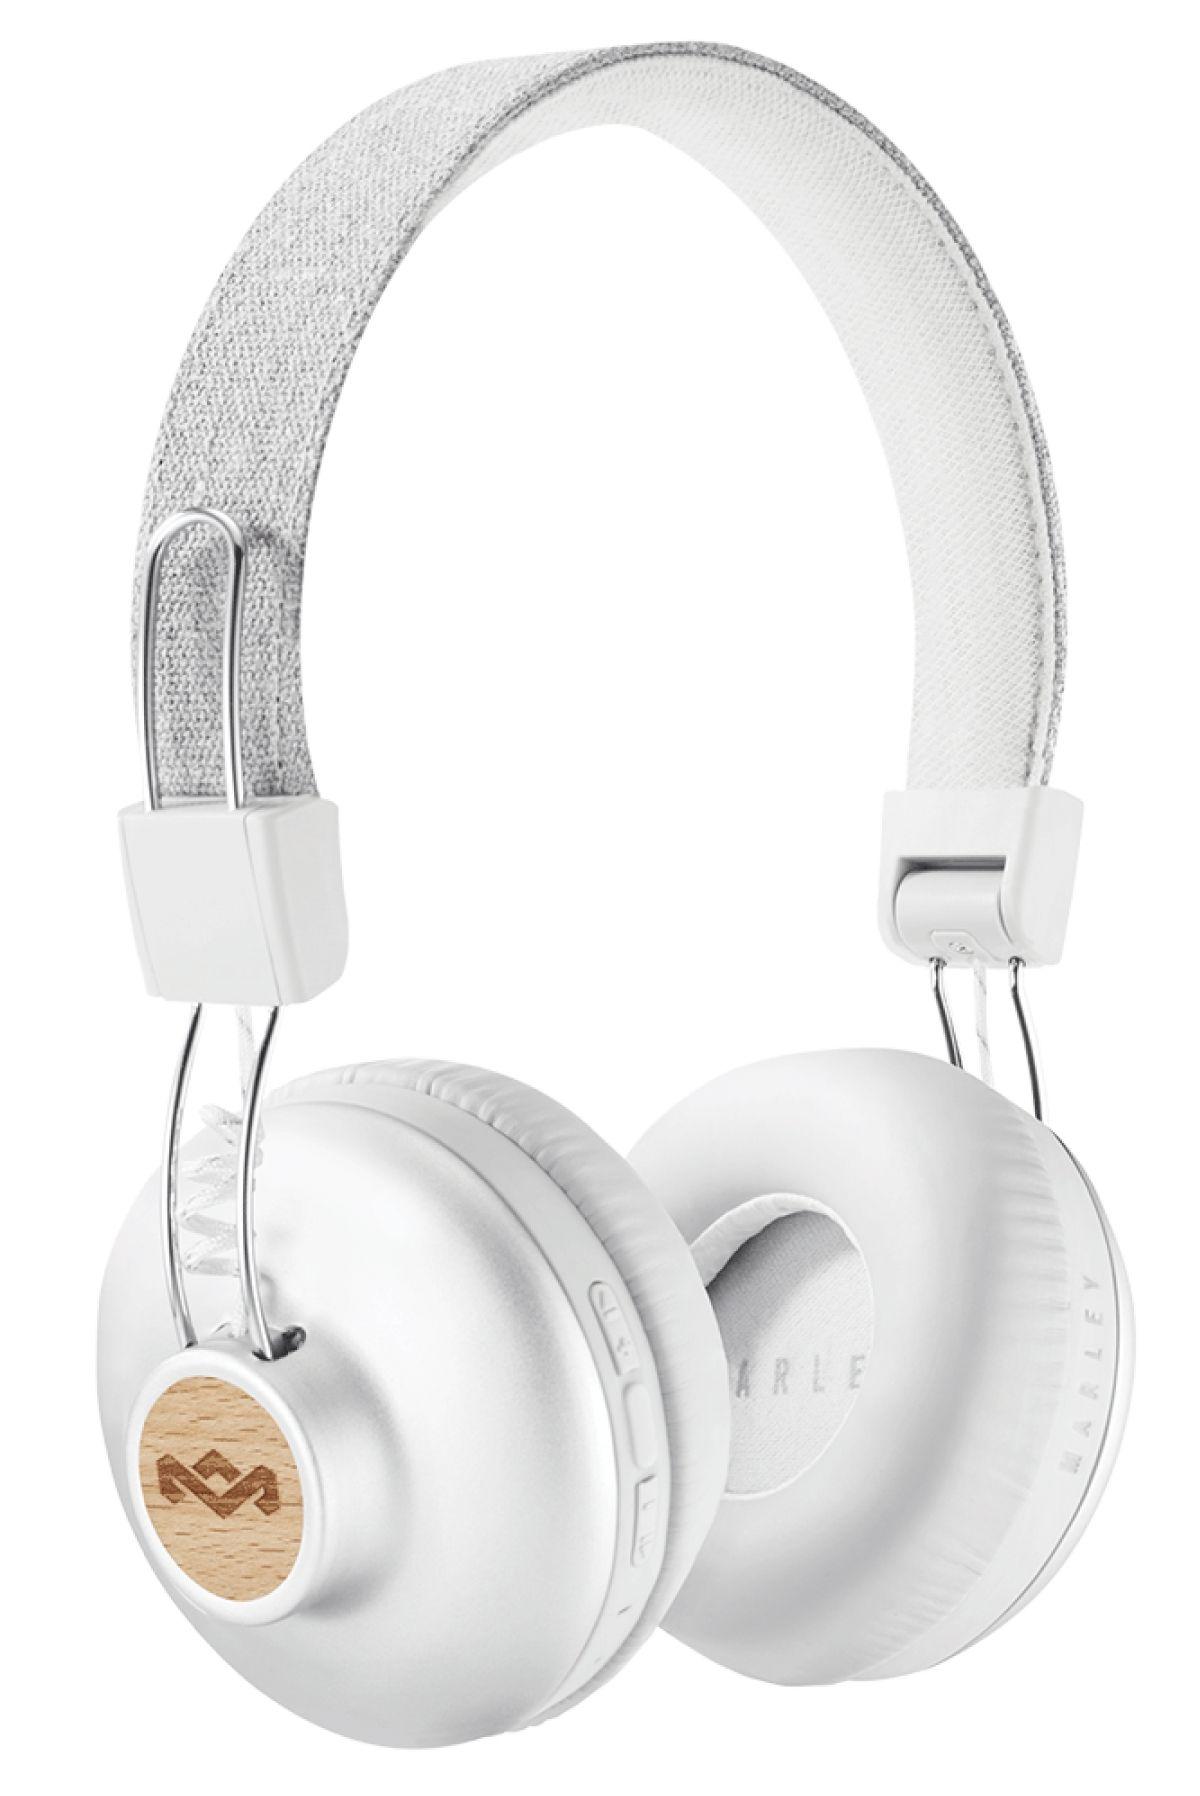 Безжични слушалки House of Marley - Positive Vibration 2, сребристи - 1